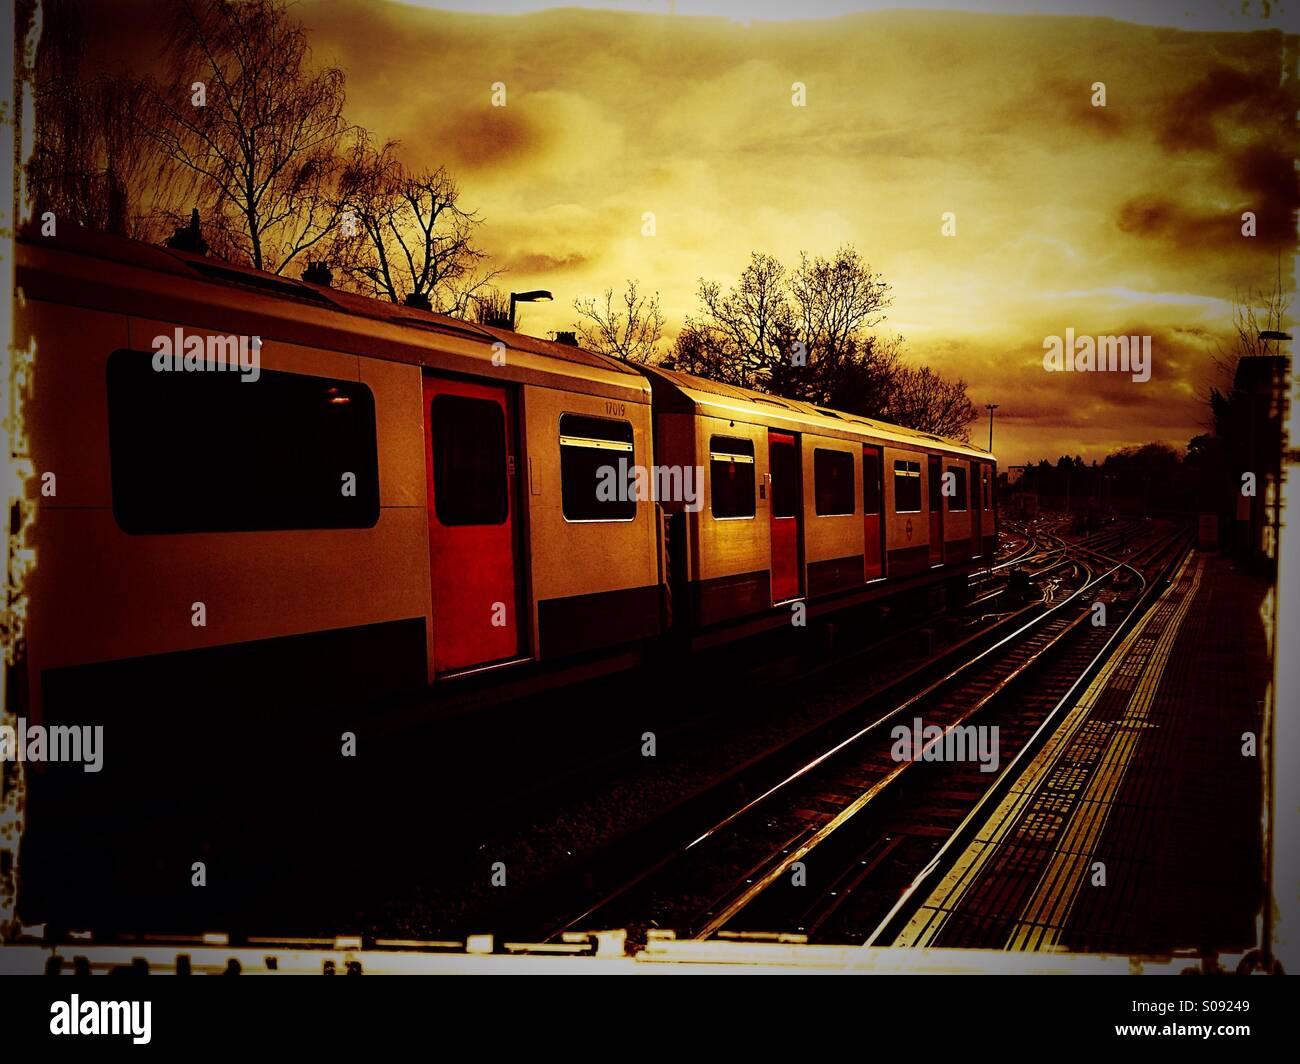 Tube train in transit, Ealing Common, London, UK Stock Photo